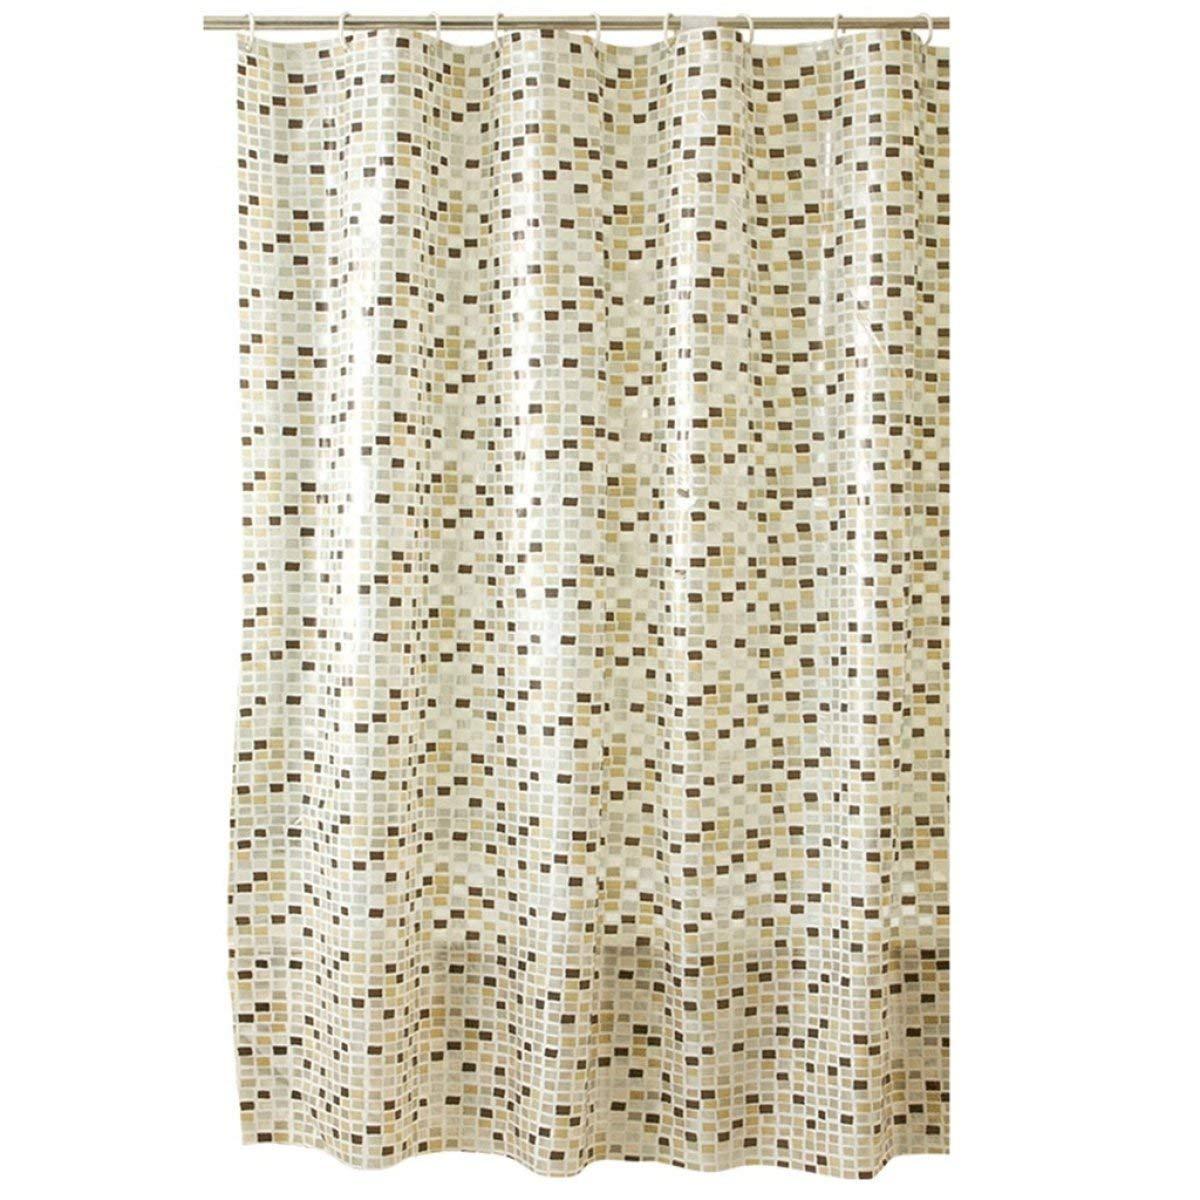 Der European Creative Fashion Simple Box PVC Barrier Transparent Waterproof Mildew Transparent Thick Bathroom Shower Curtain Bathroom Accessories